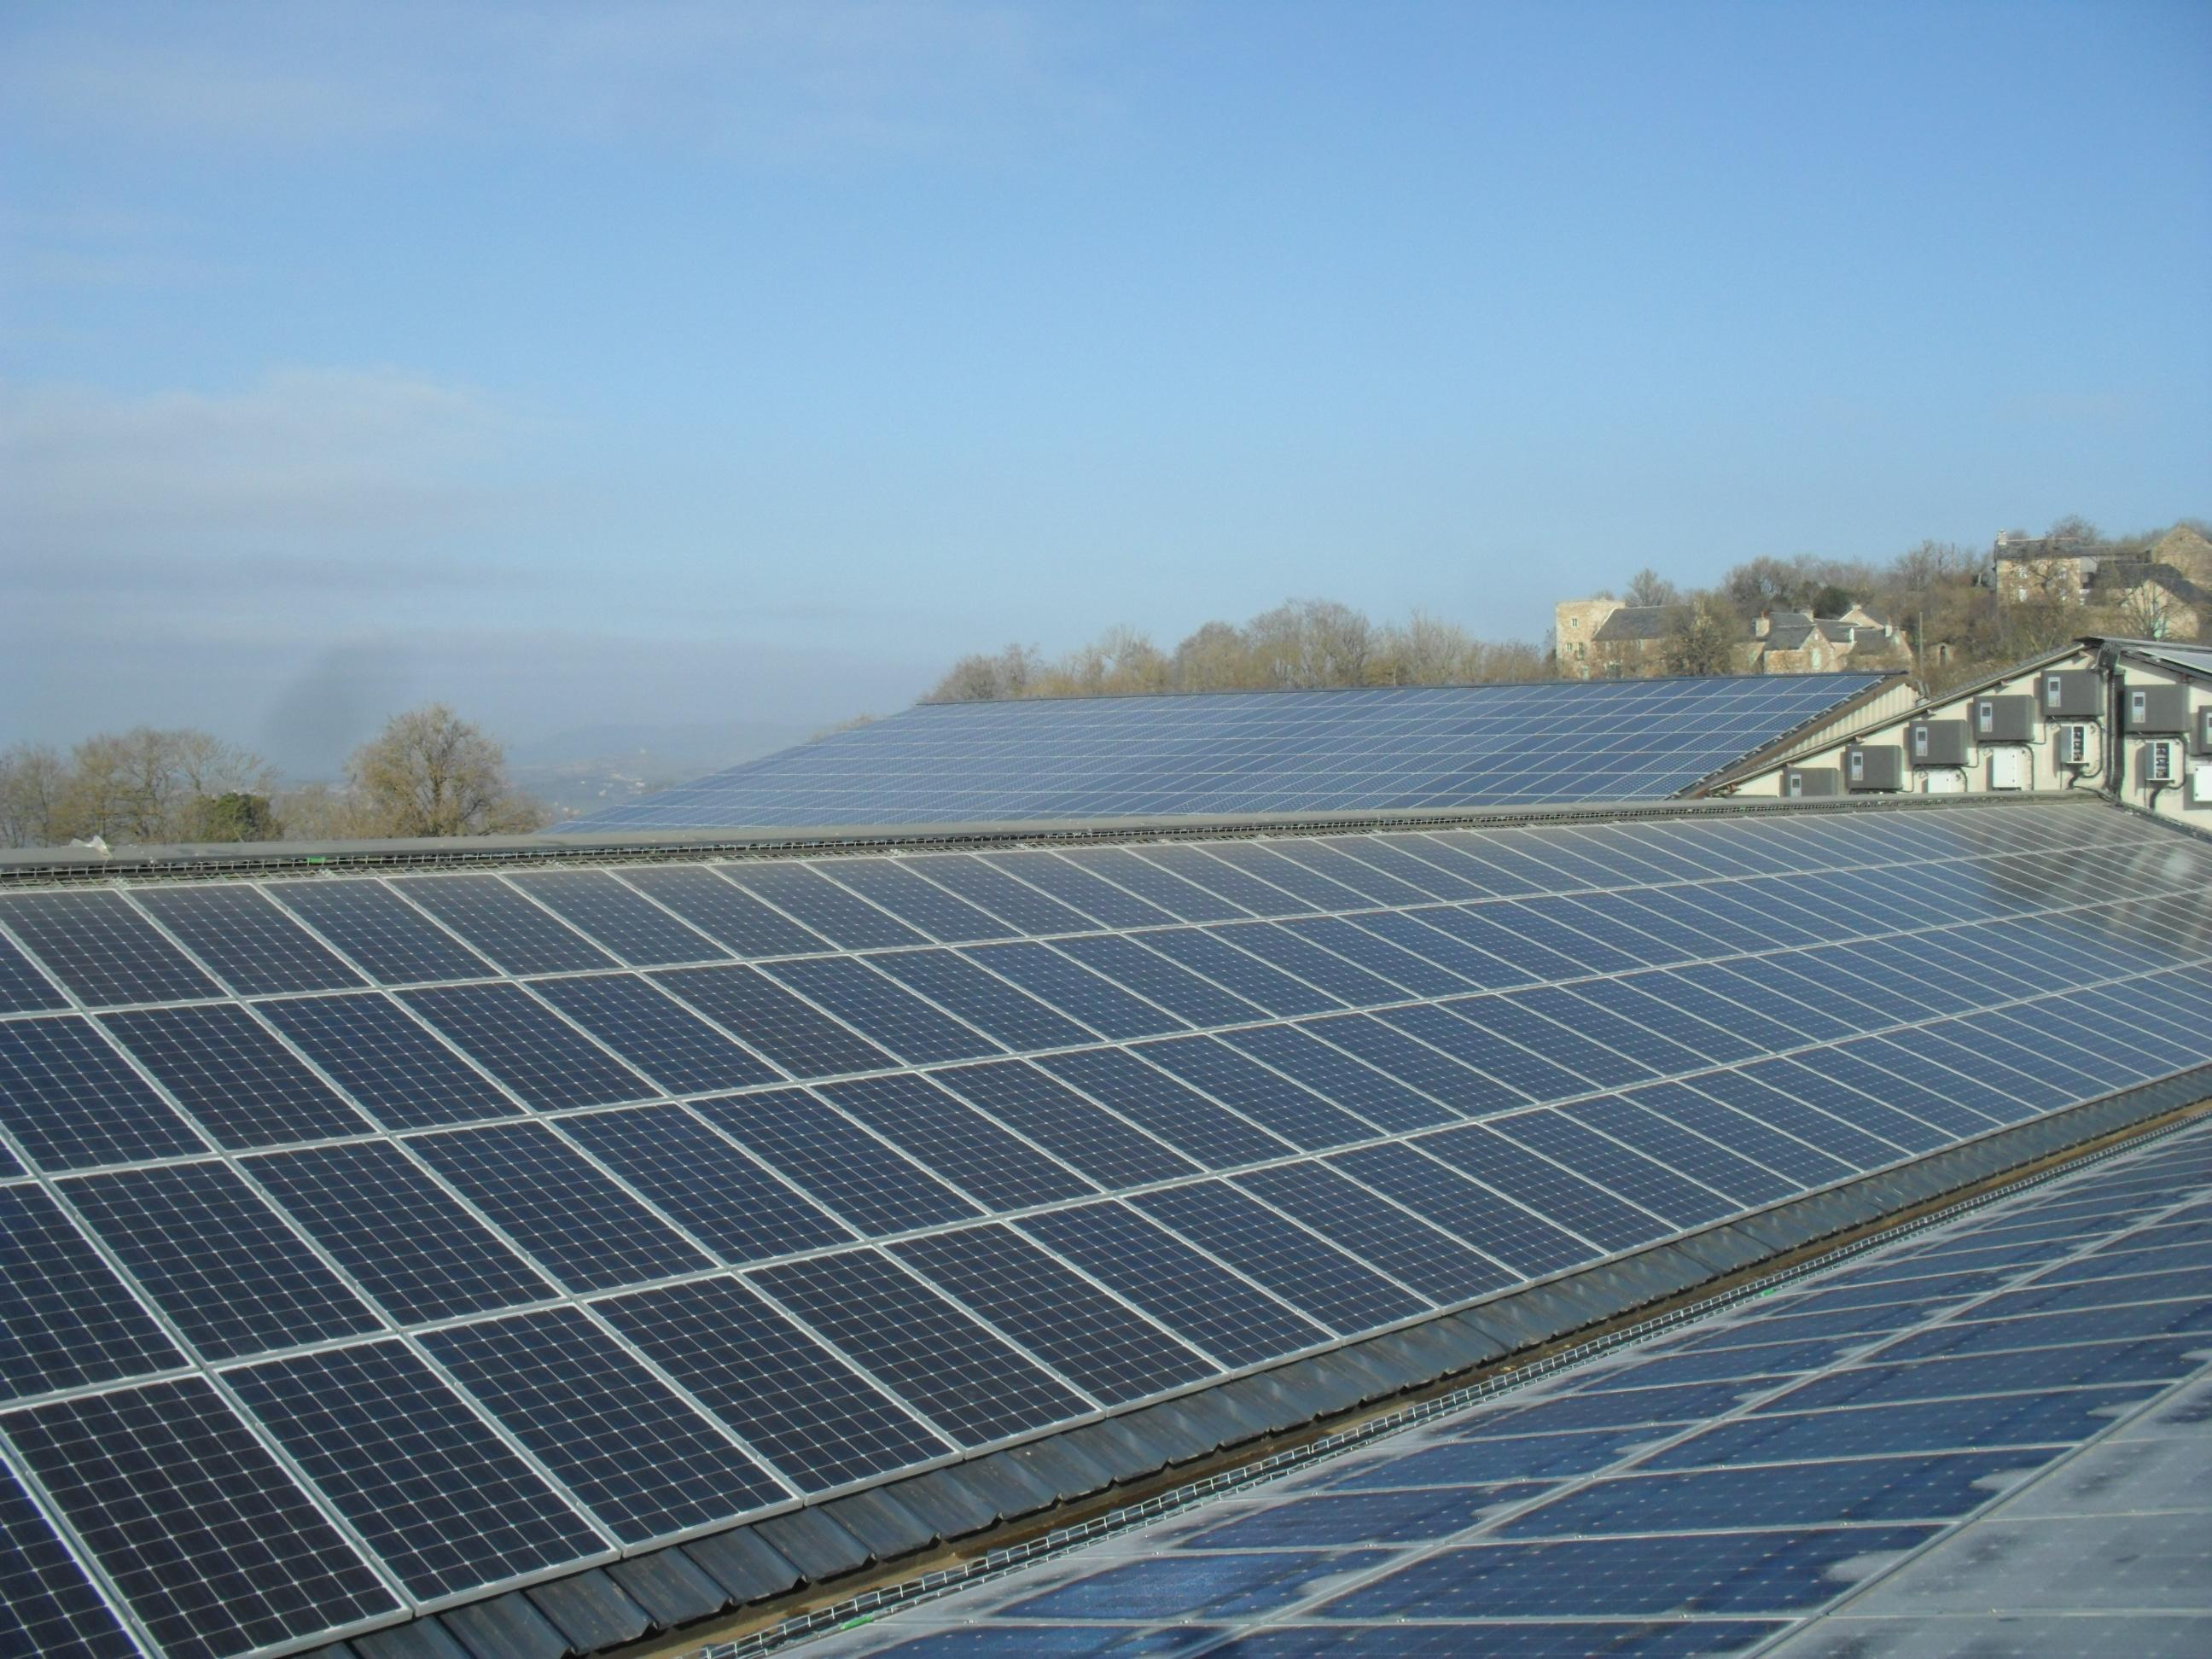 Module photovoltaique